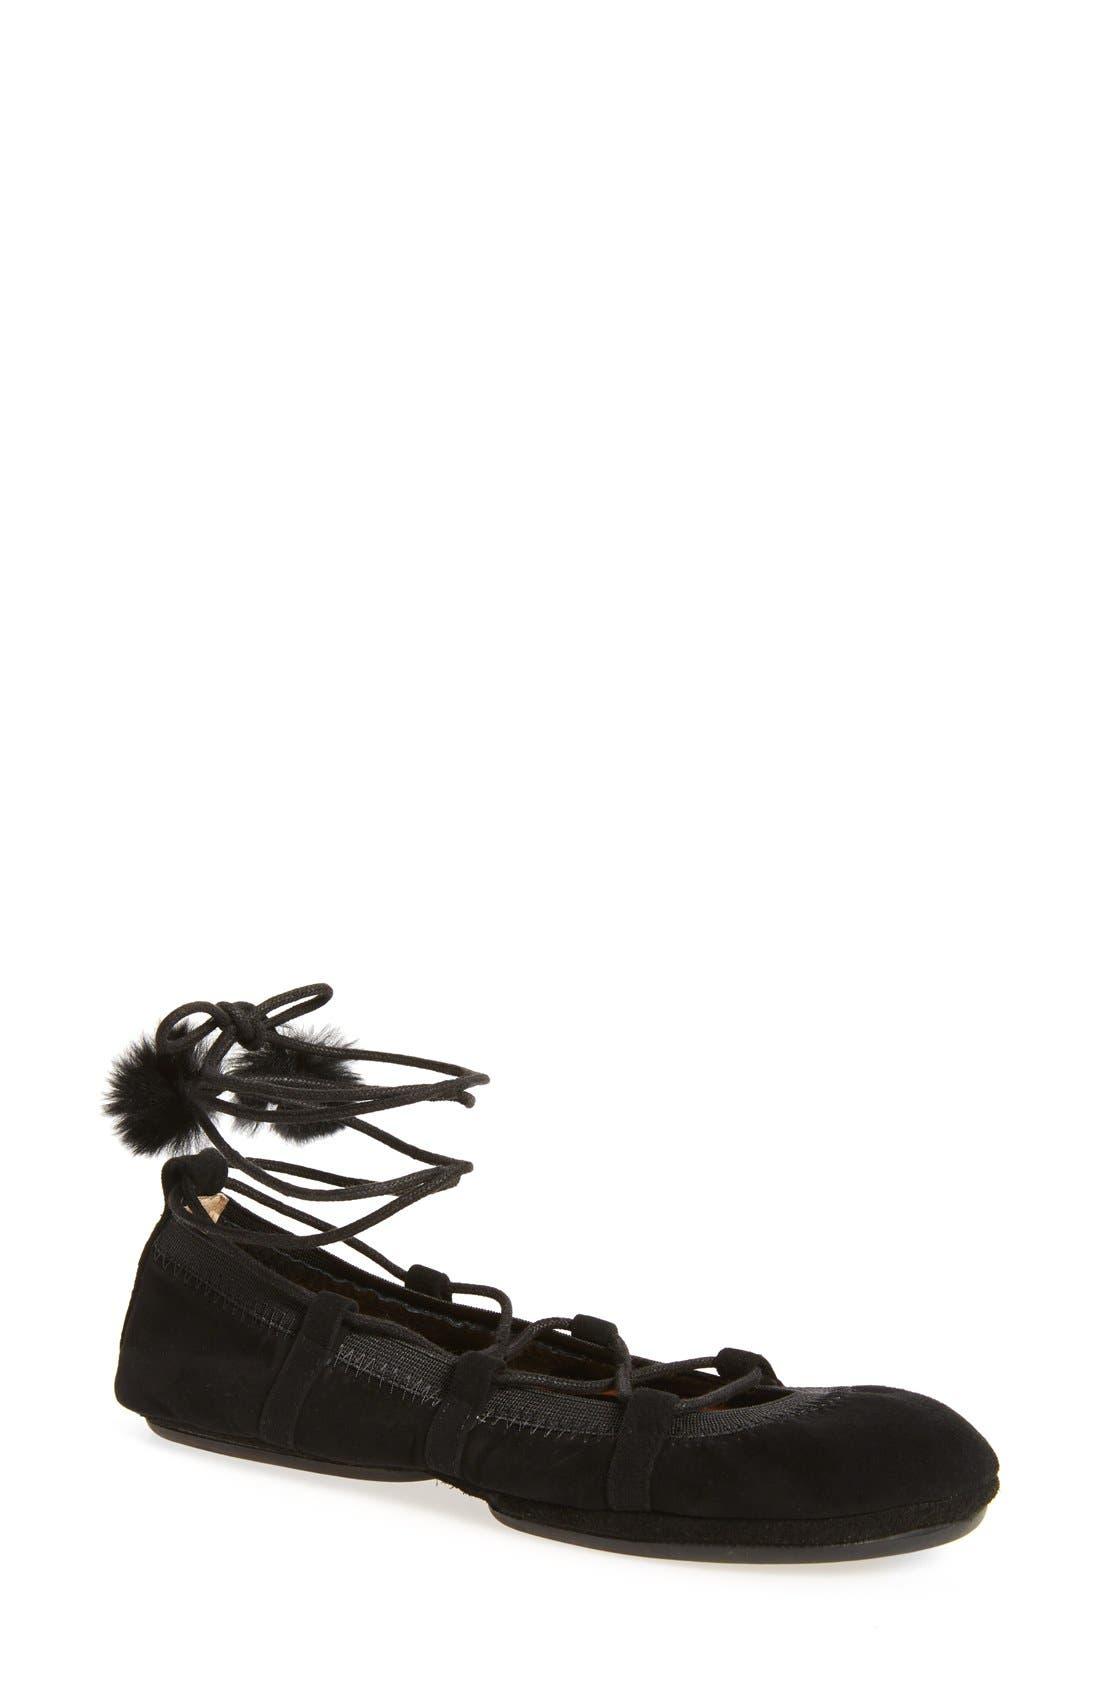 Main Image - Yosi Samra Seleste Foldable Ballet Flat (Women)